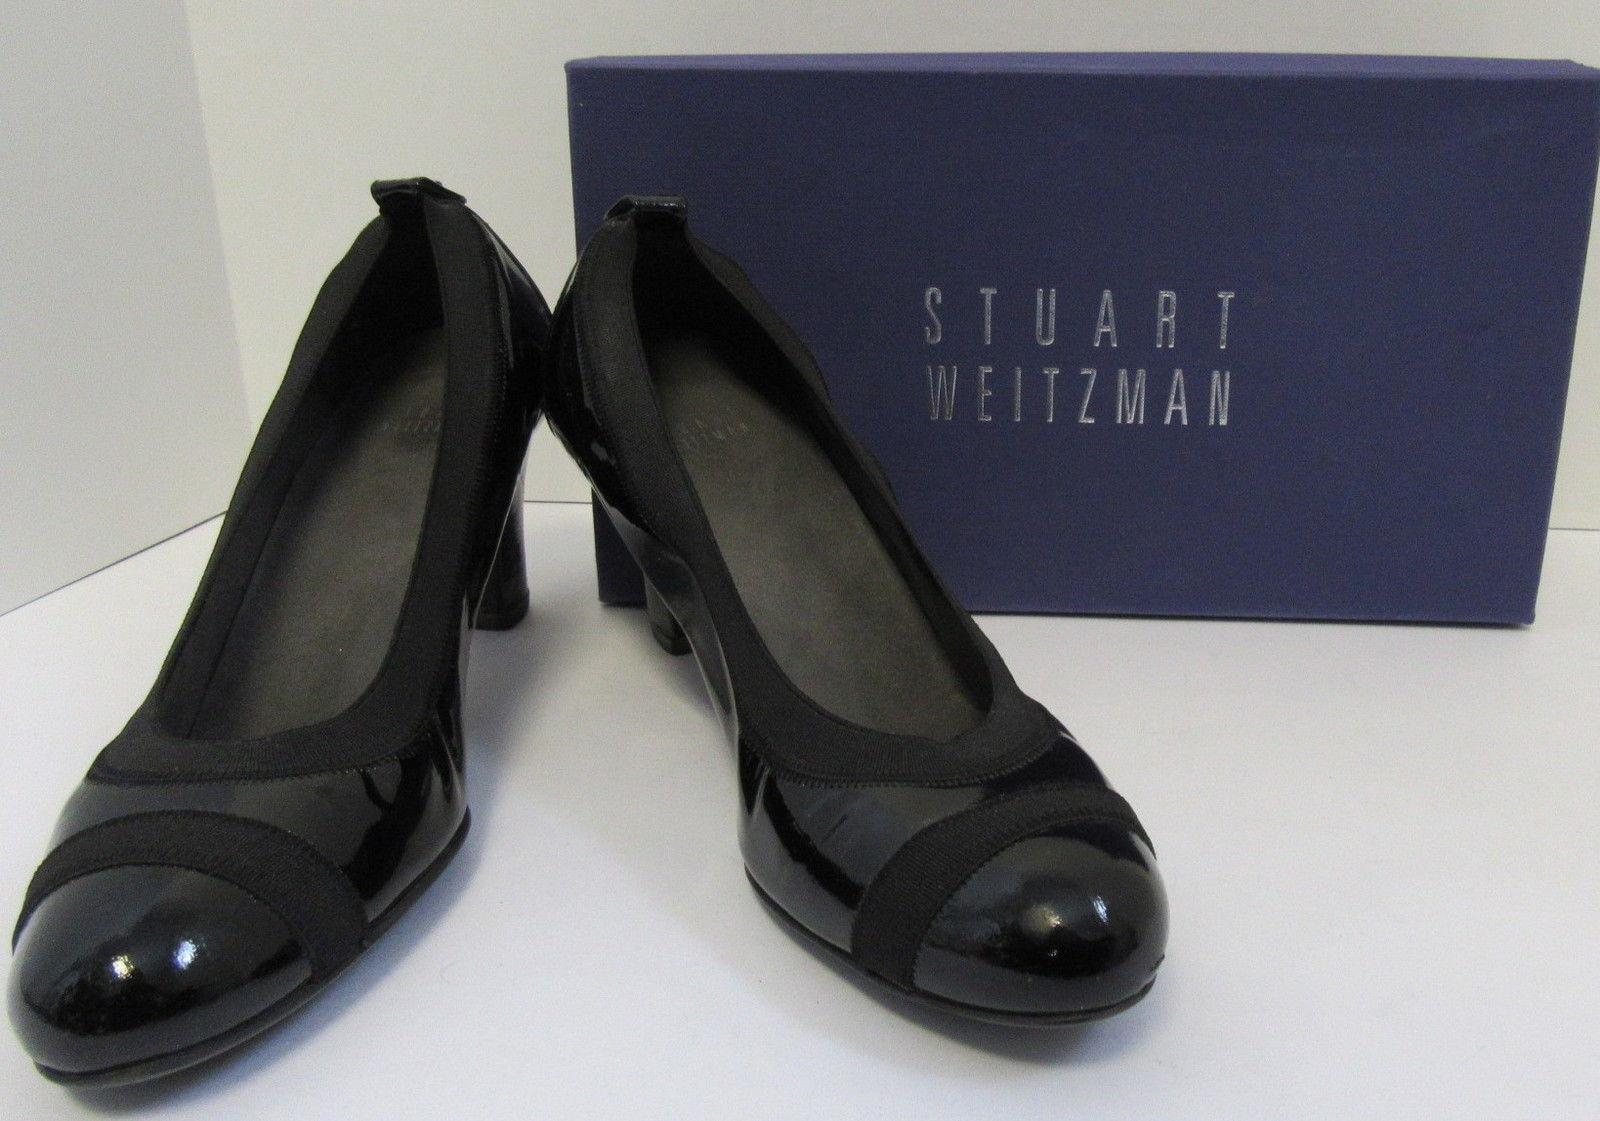 STUART WEITZMAN woman's EASILY schwarz patent Leder pumps Größe 7.5 N